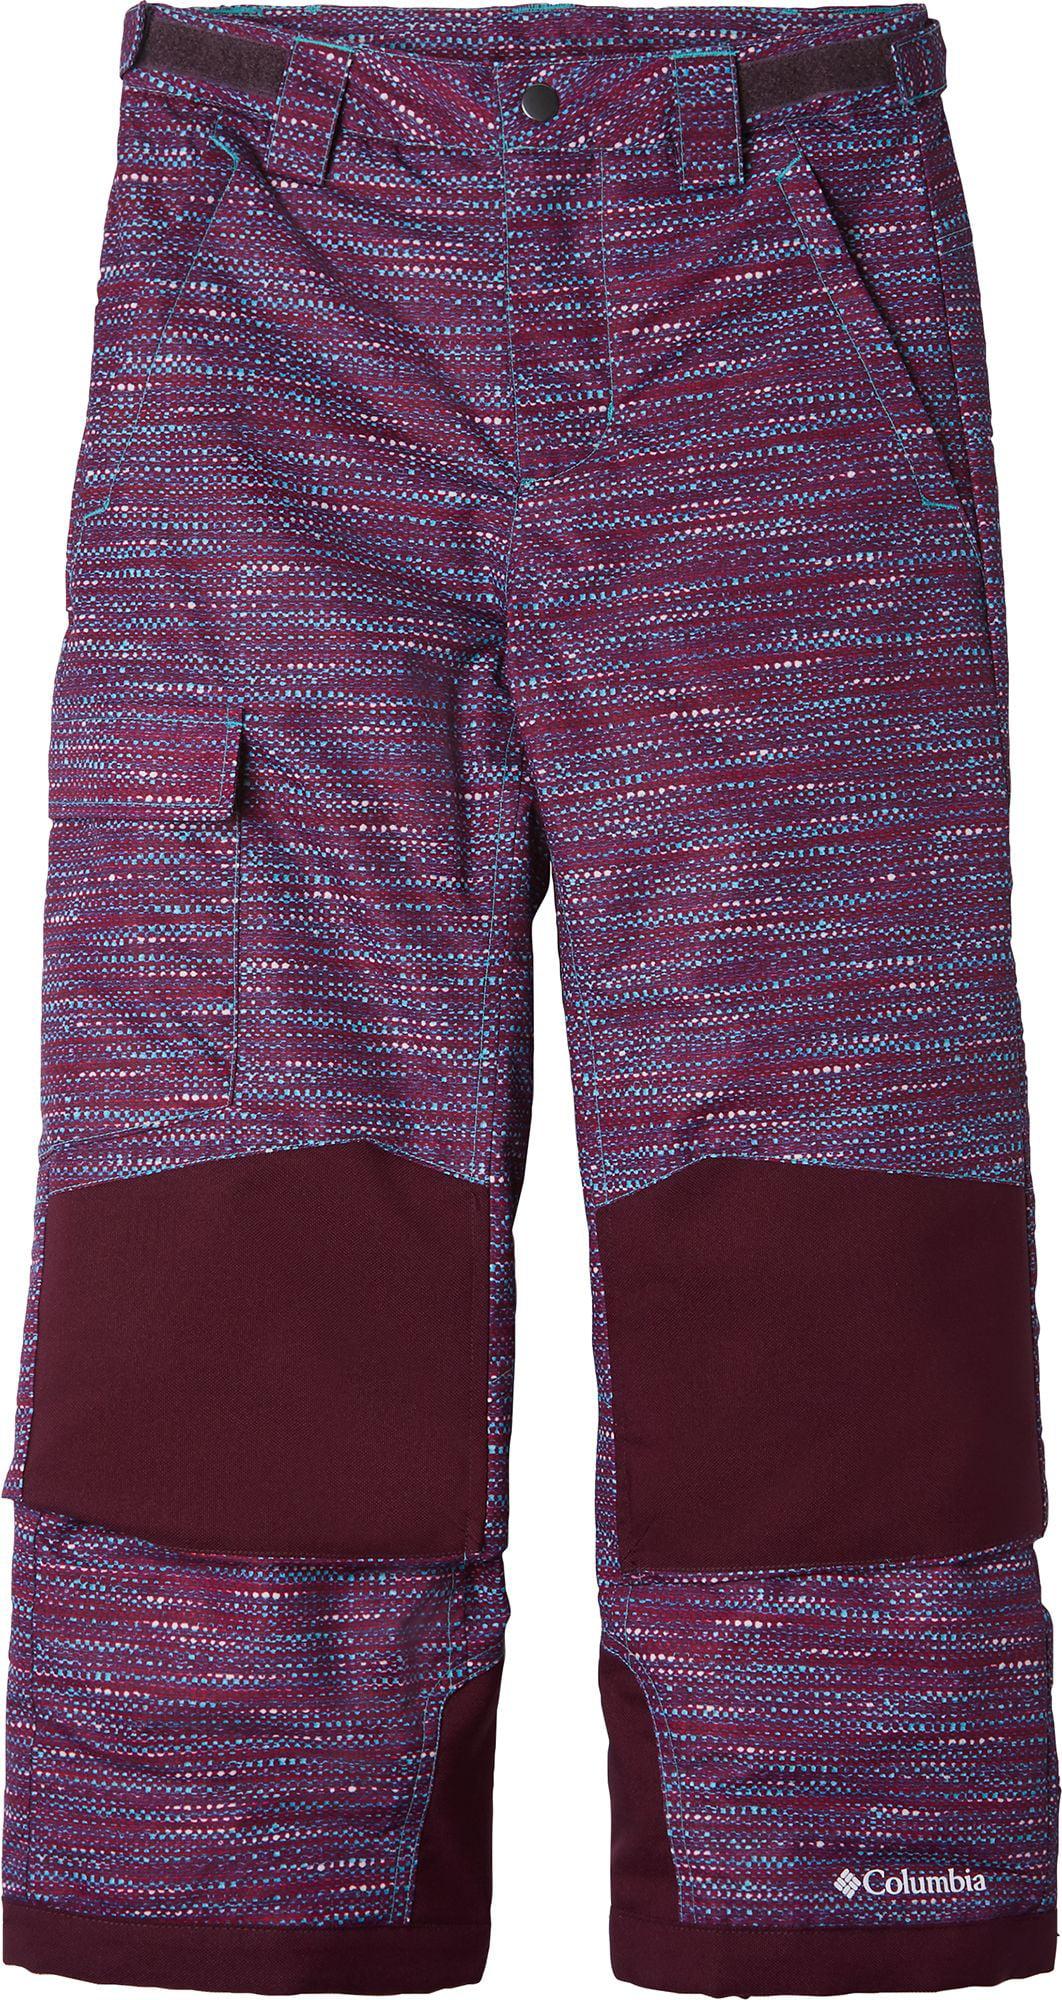 "New Girls Columbia /""Bugaboo/"" Omni-Heat Insulated Outgrown Winter Skipants Pants"